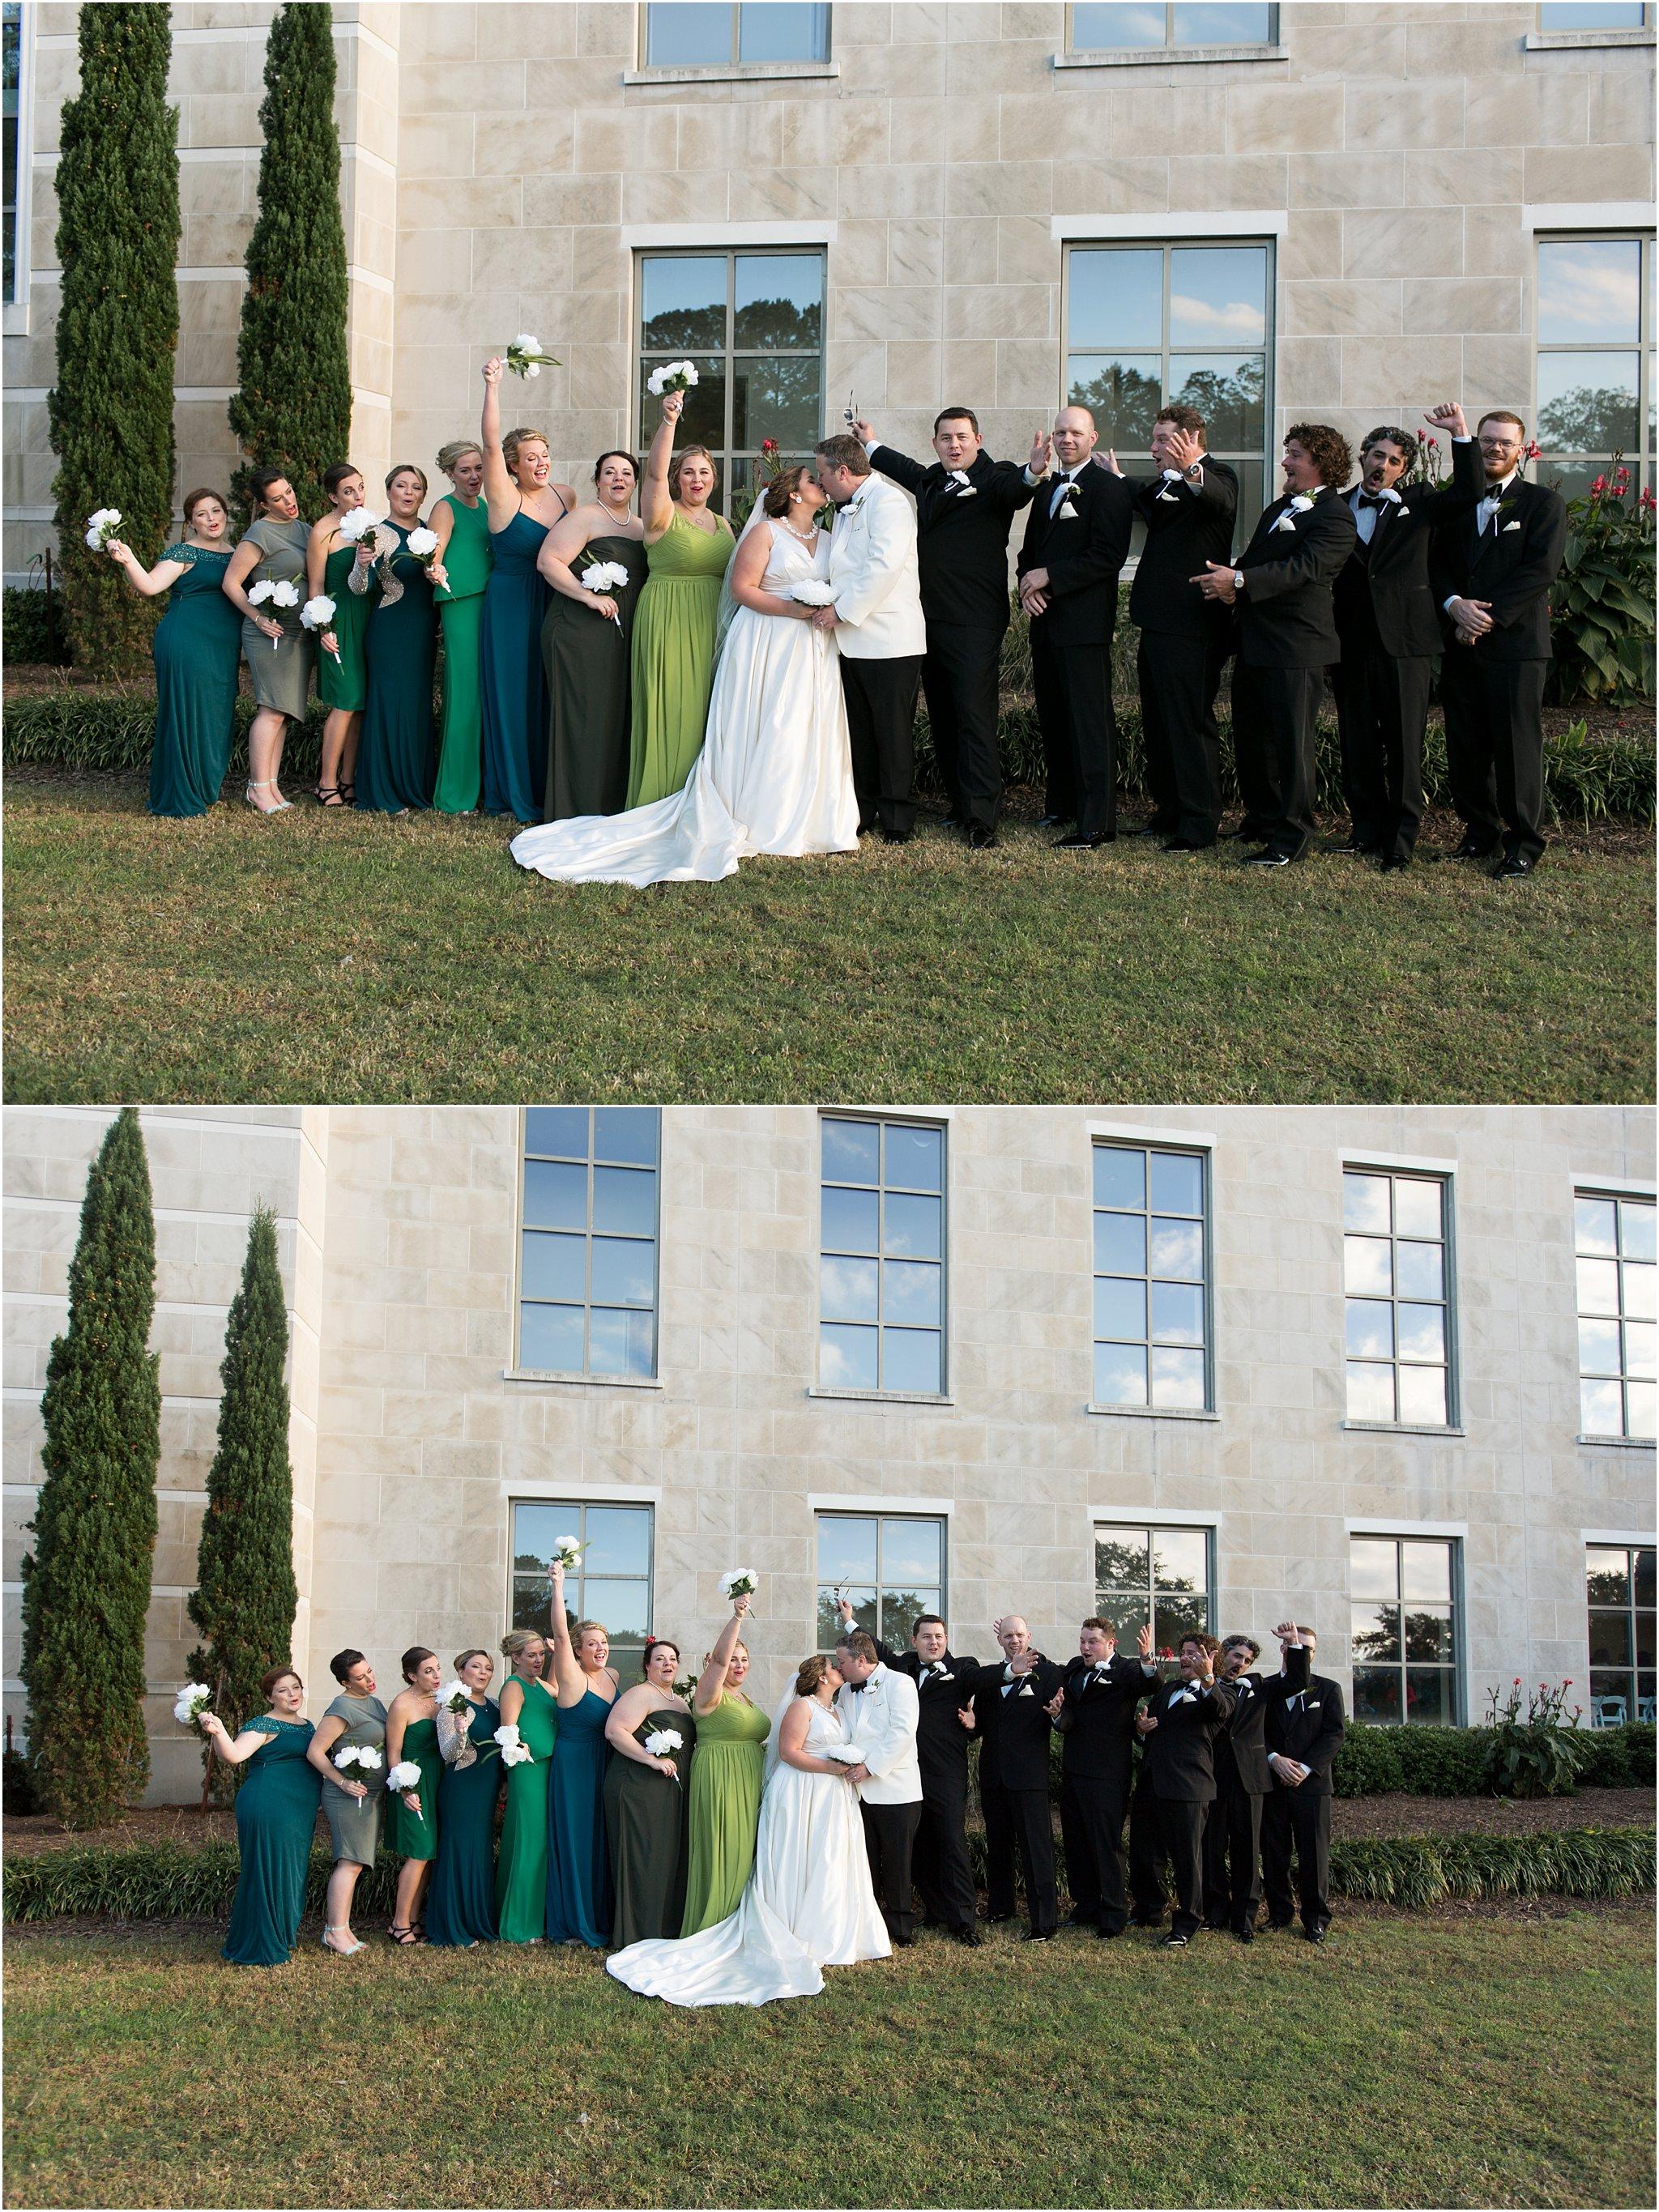 va_jessica_ryan_photography_virginia_wedding_norfolk_harrison_opera_house_norfolk_arts_district_portraits_3796